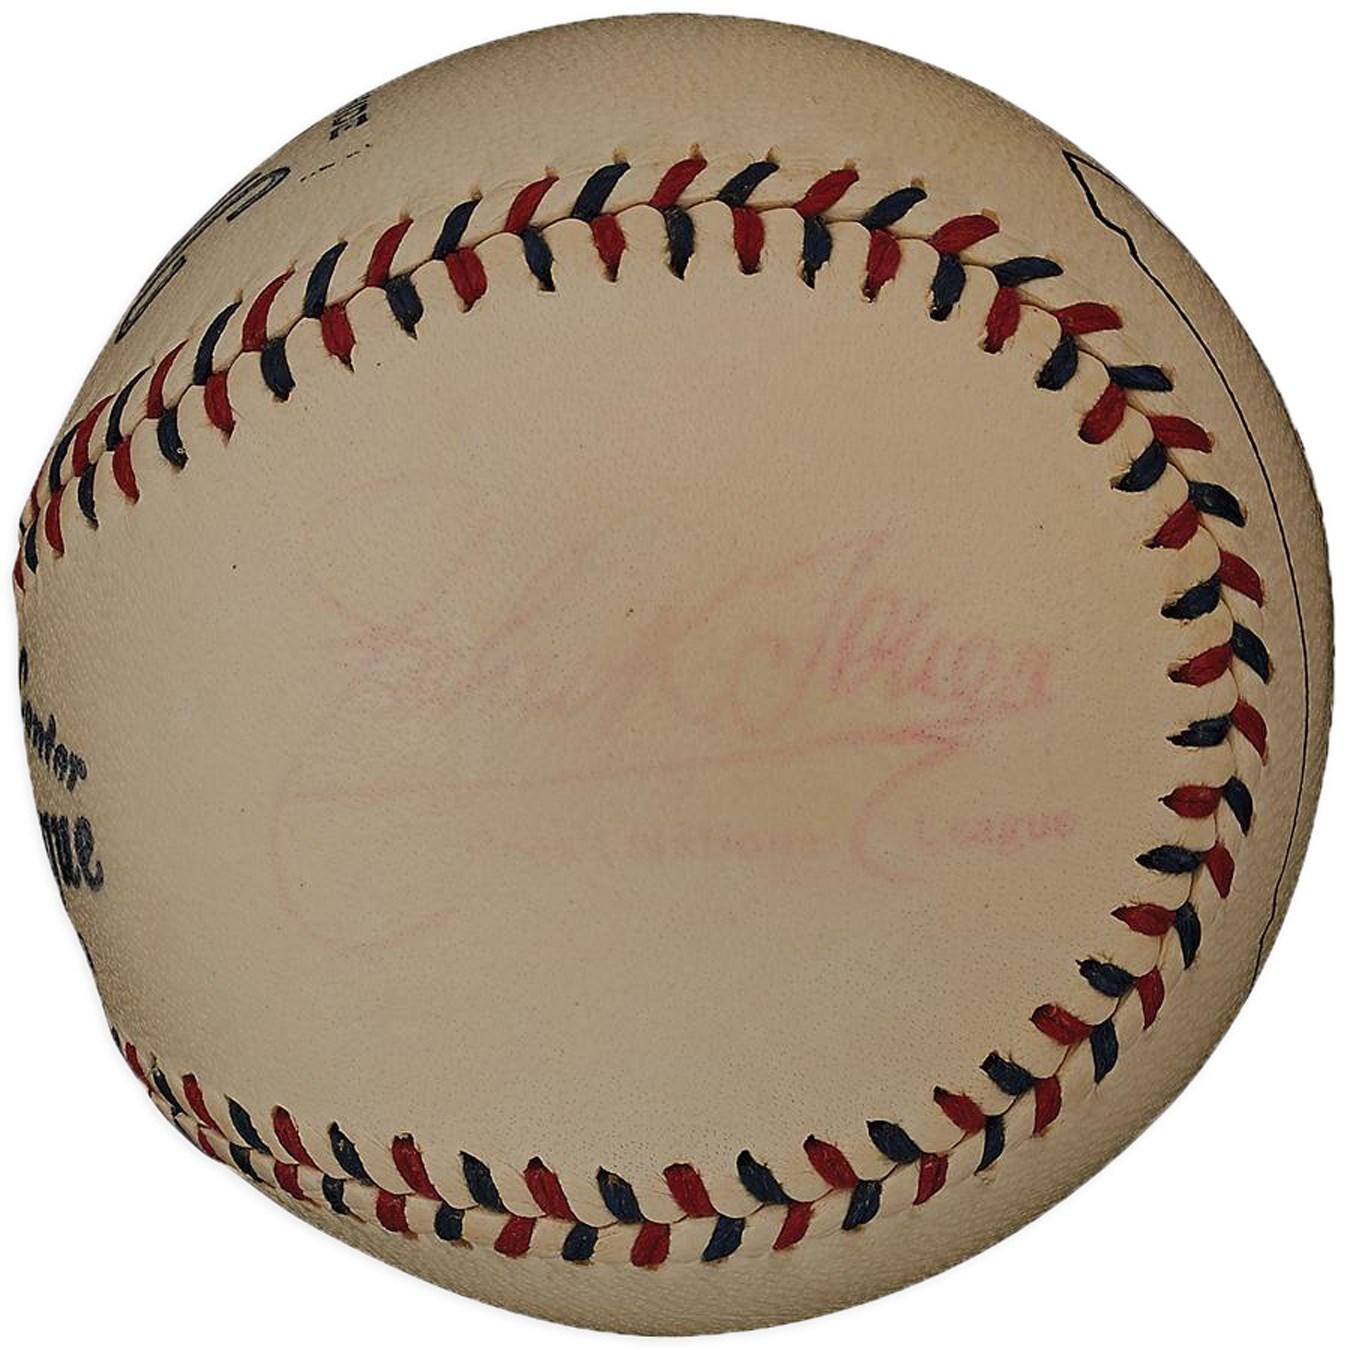 Official National League Baseball with John K. Tener as President